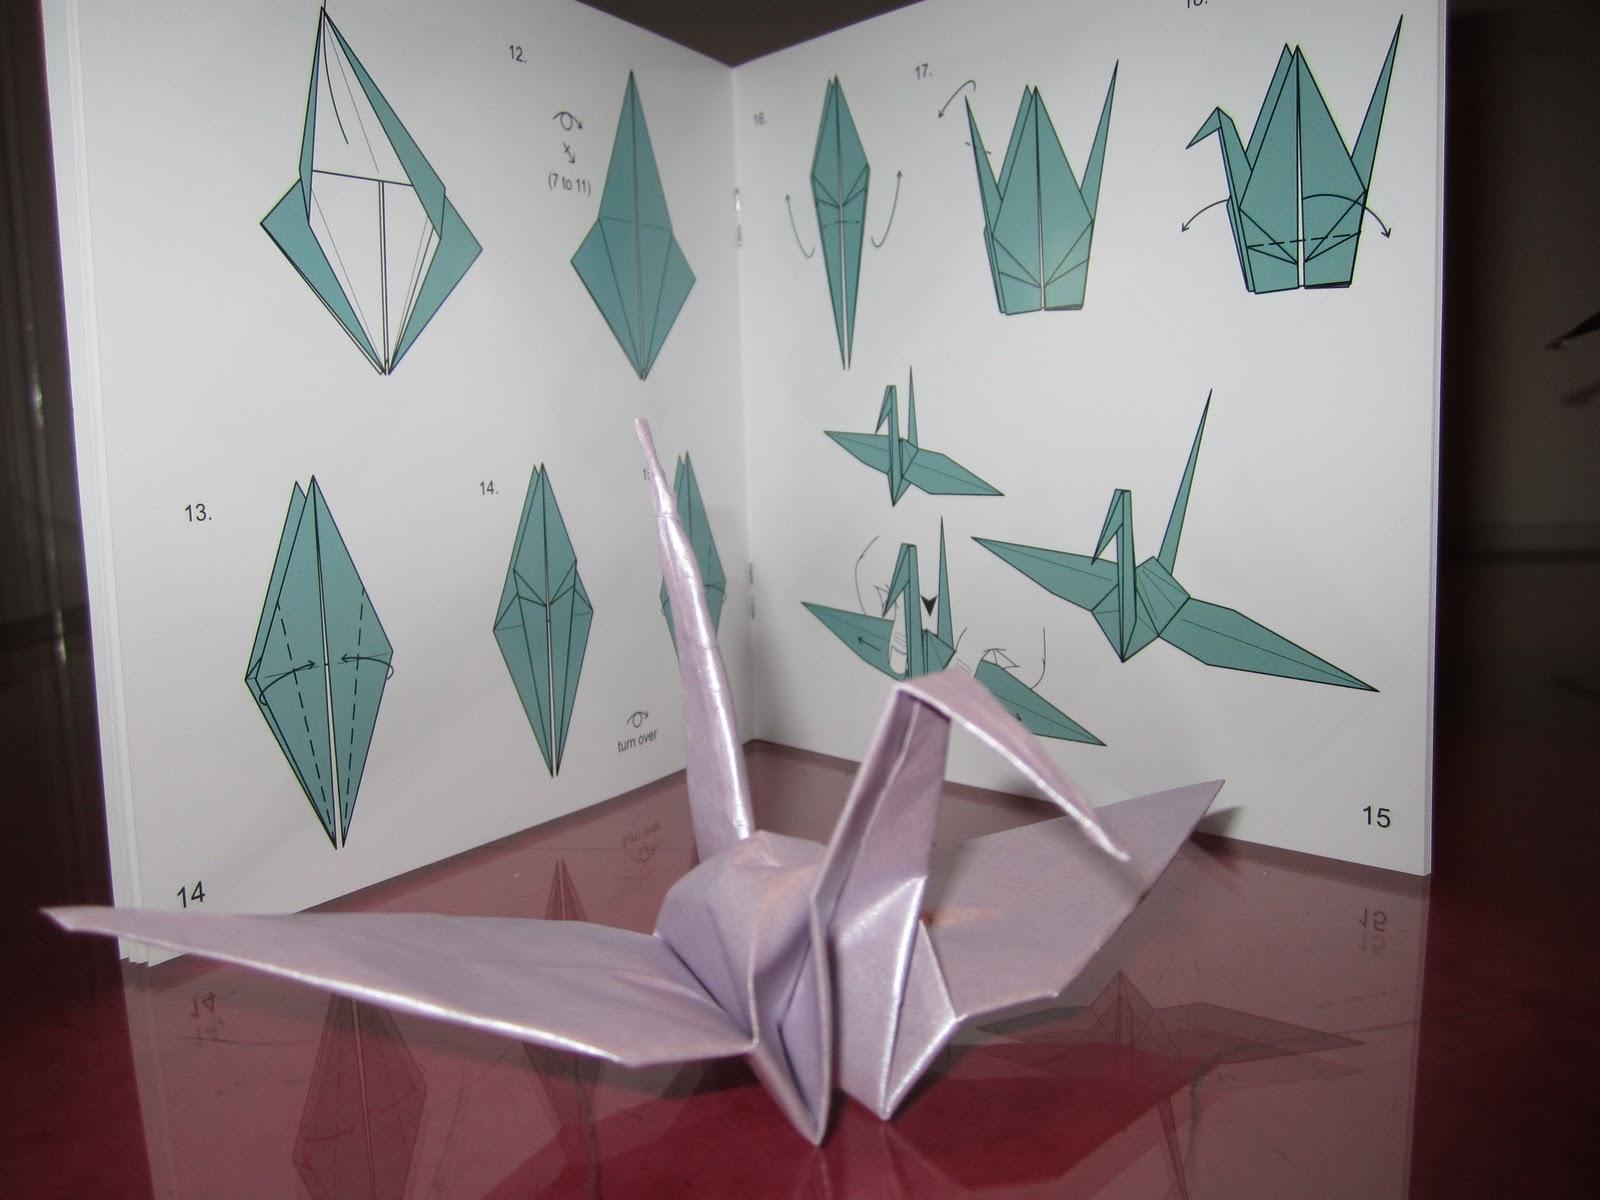 100 Thingsau Megsy Number 21 Make 1000 Paper Cranes